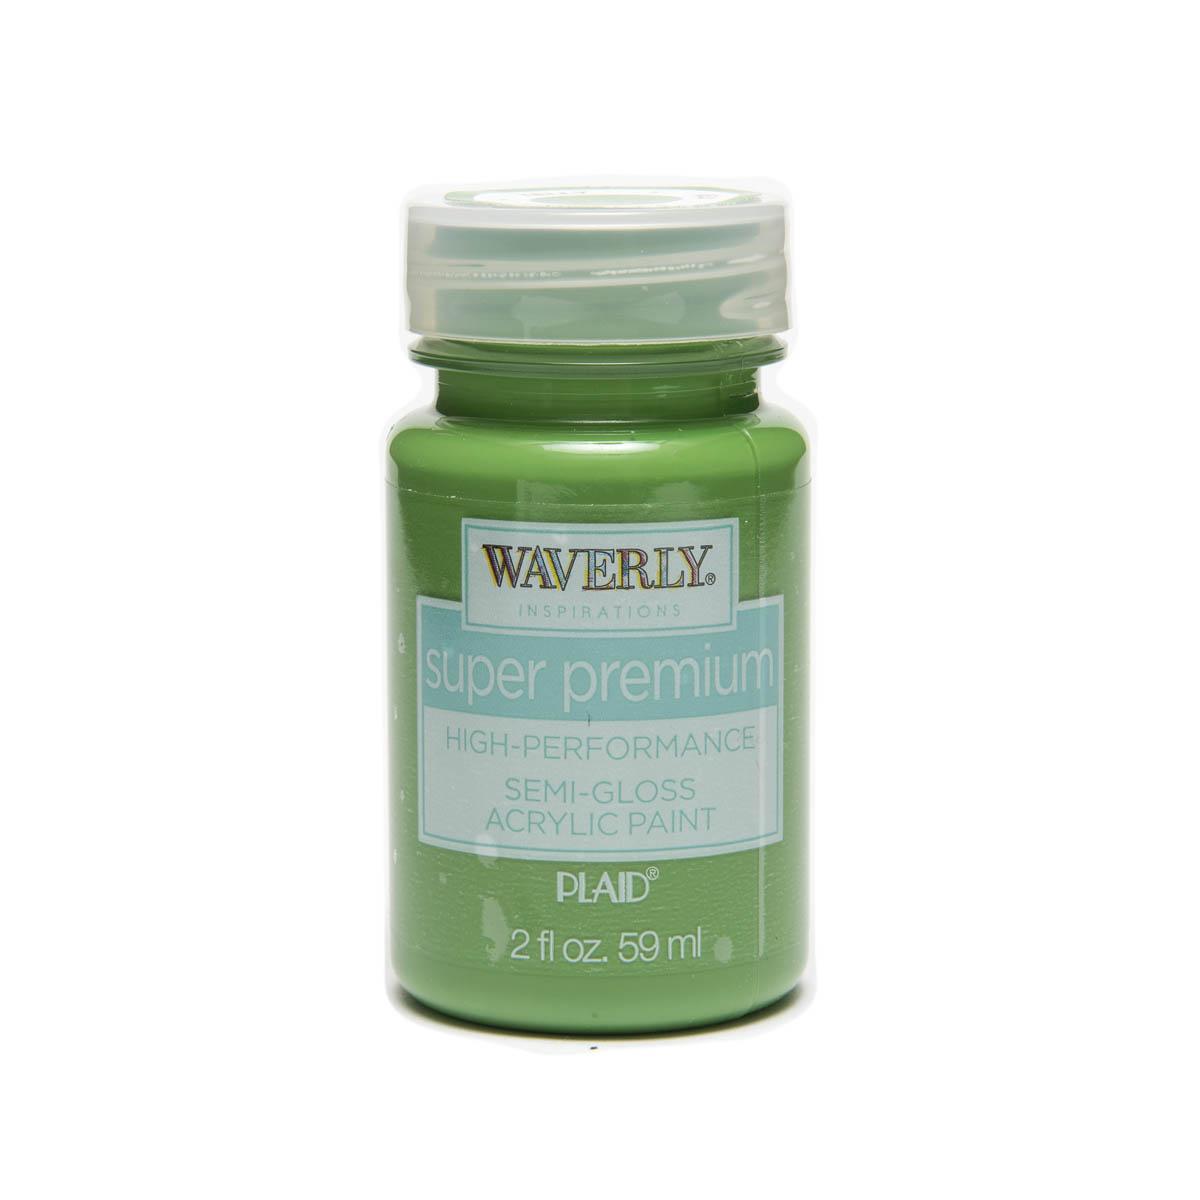 Waverly ® Inspirations Super Premium Semi-Gloss Acrylic Paint - Kelly, 2 oz. - 60627E